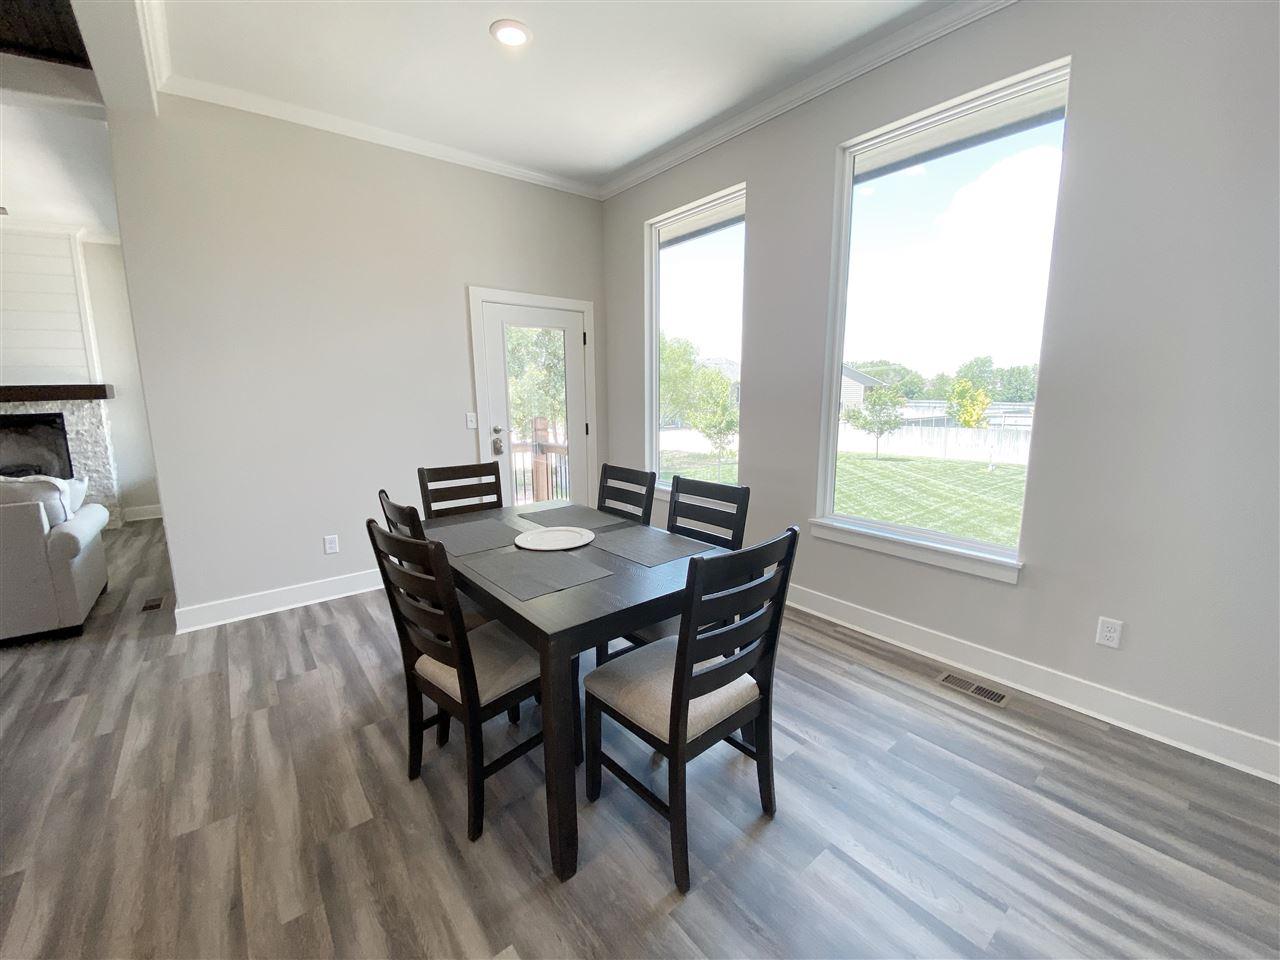 For Sale: 2854 58th St. N., Wichita, KS, 67204,